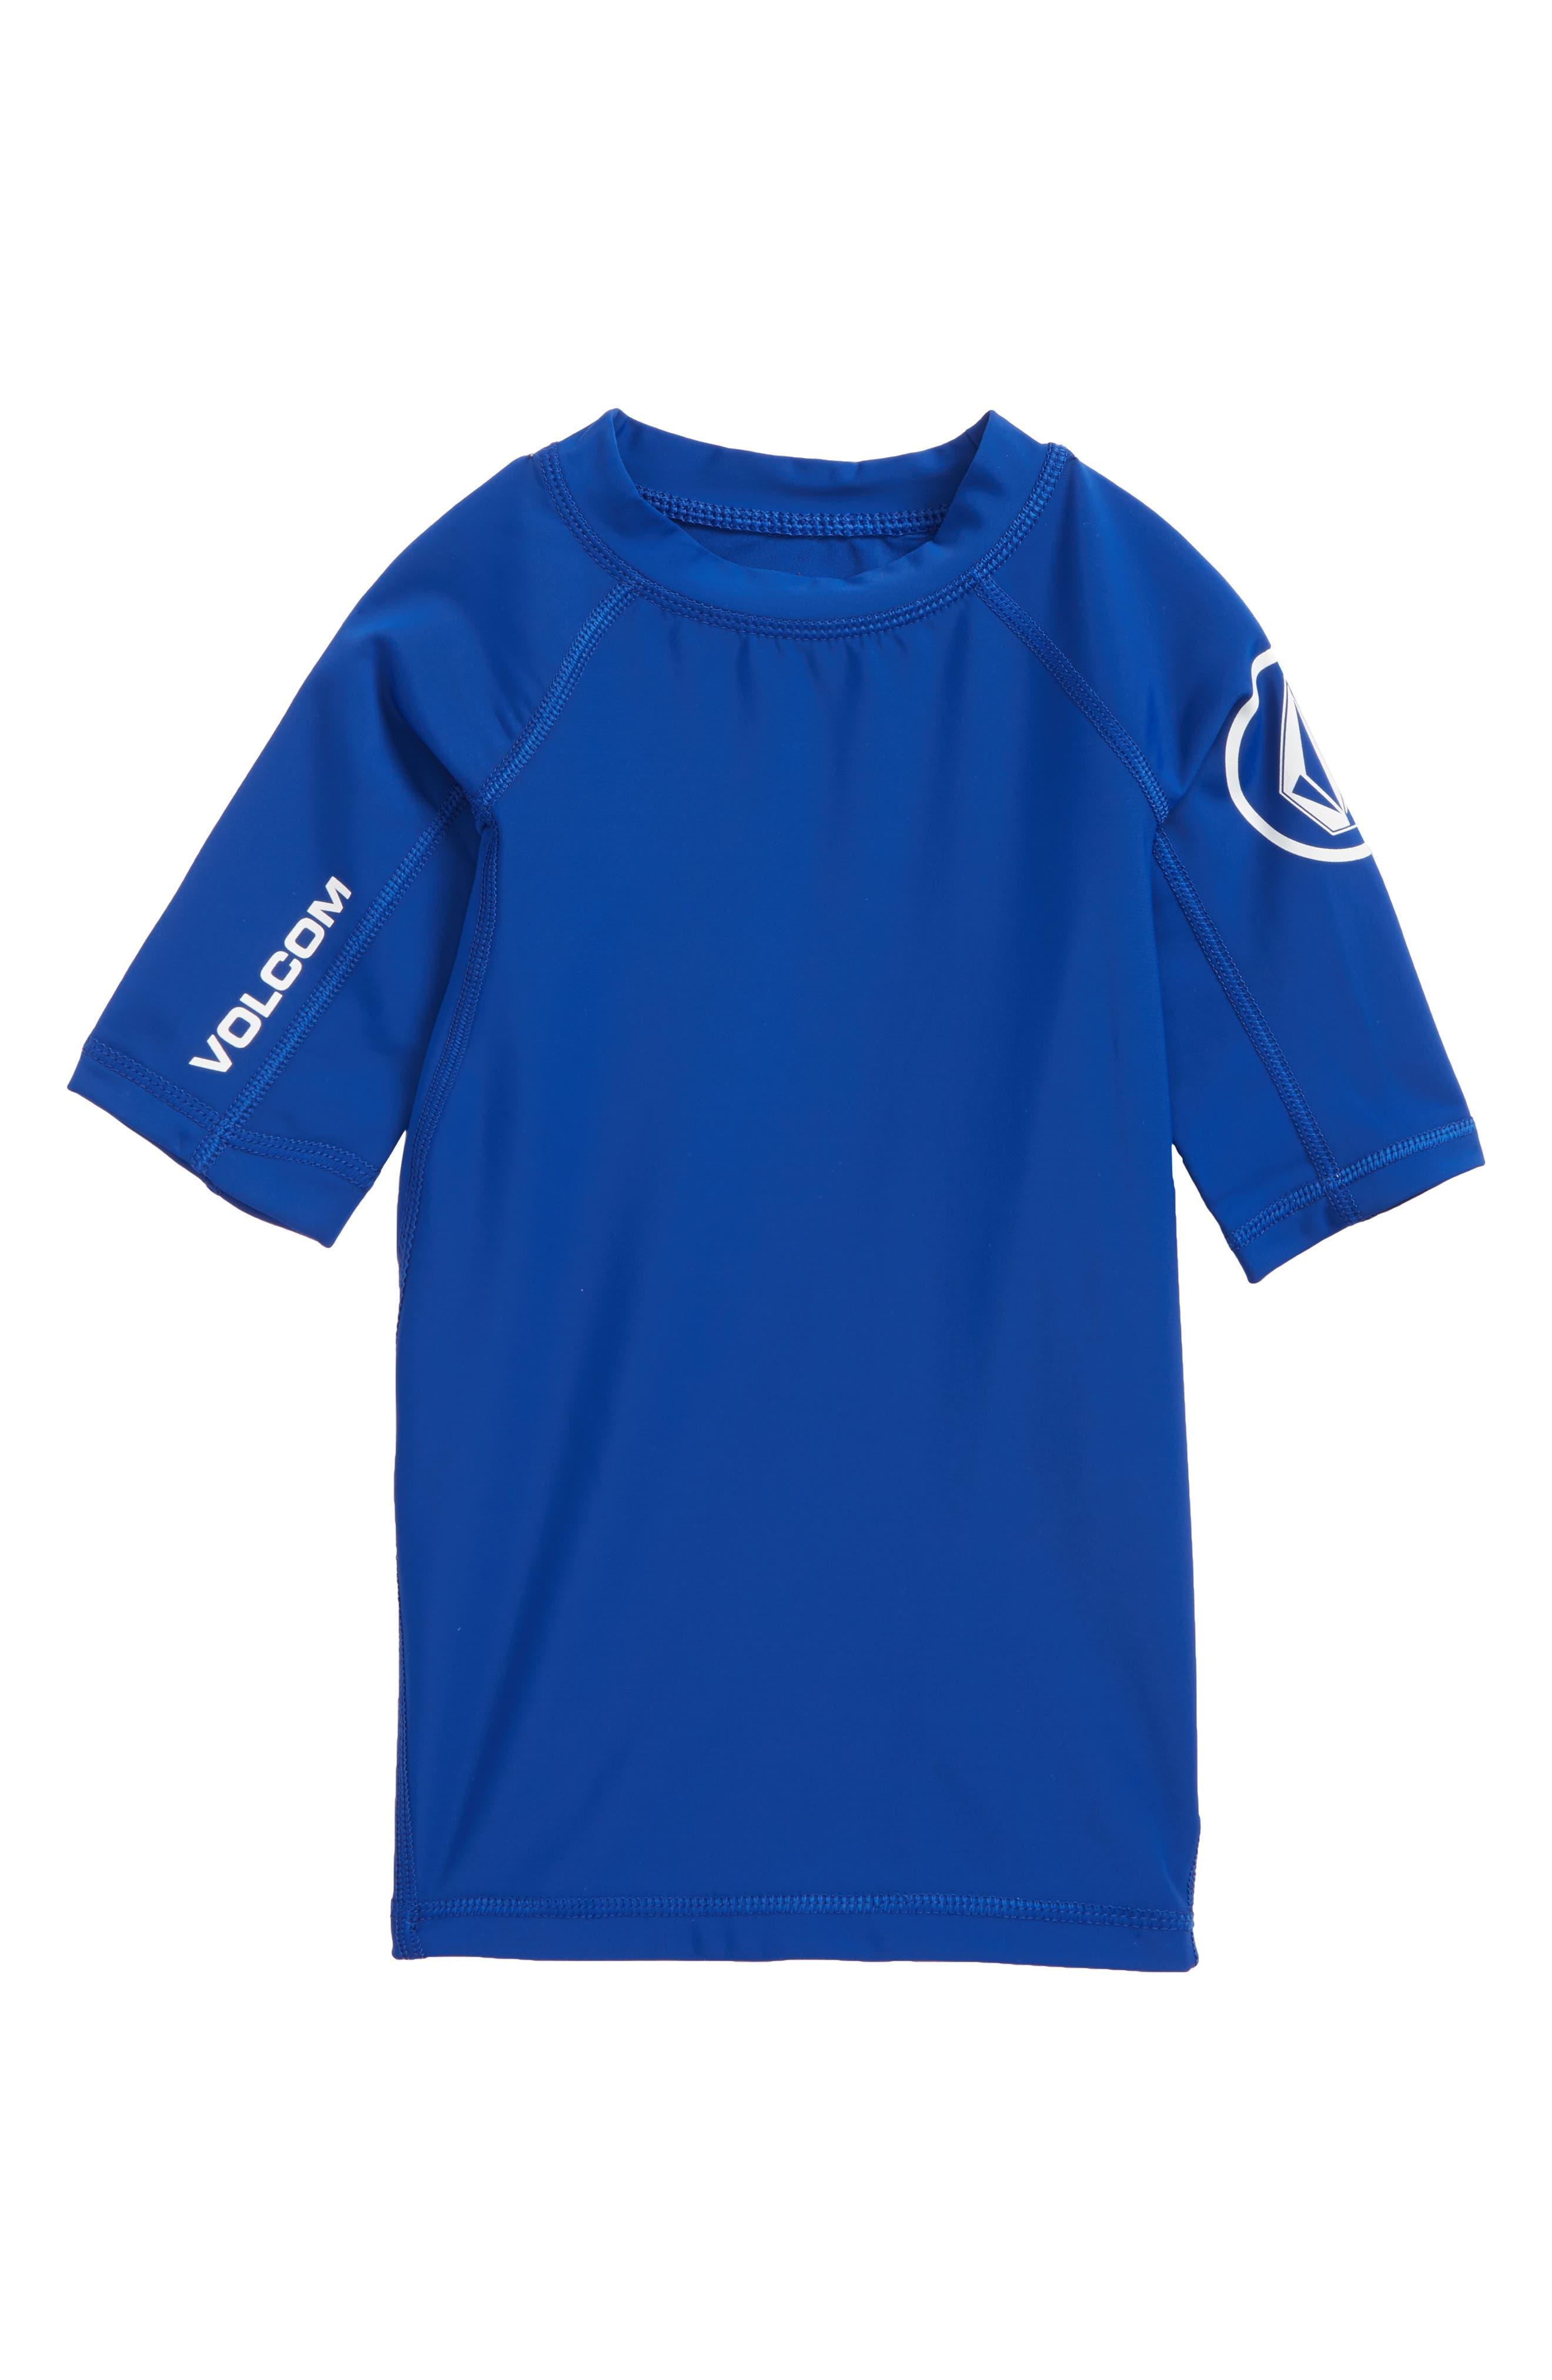 Lido Solid Rashguard,                         Main,                         color, Camper Blue